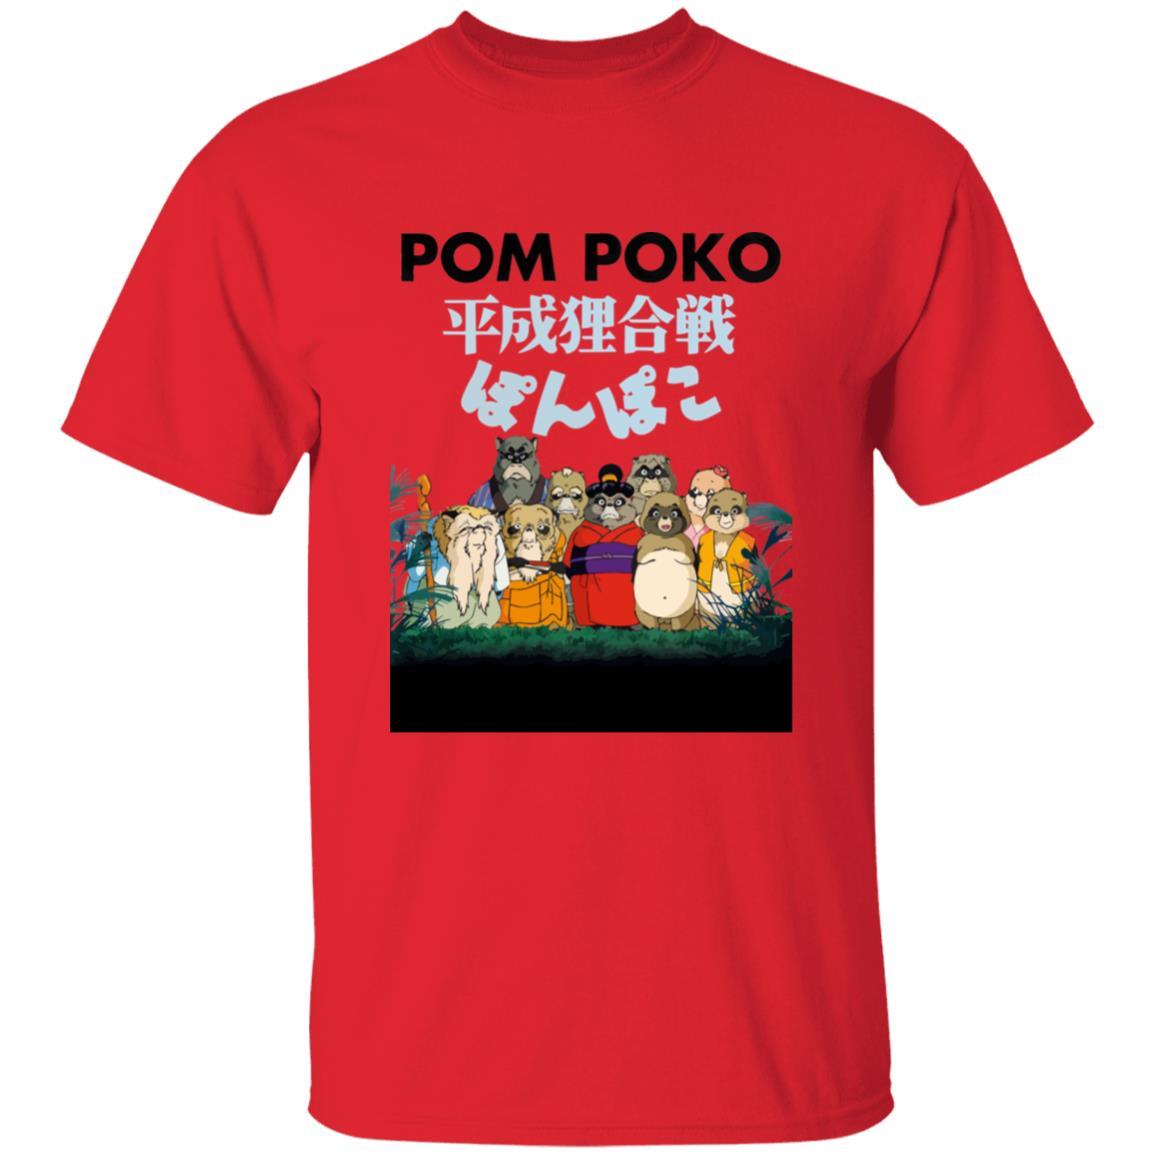 Pom Poko Poster Japanese T Shirt